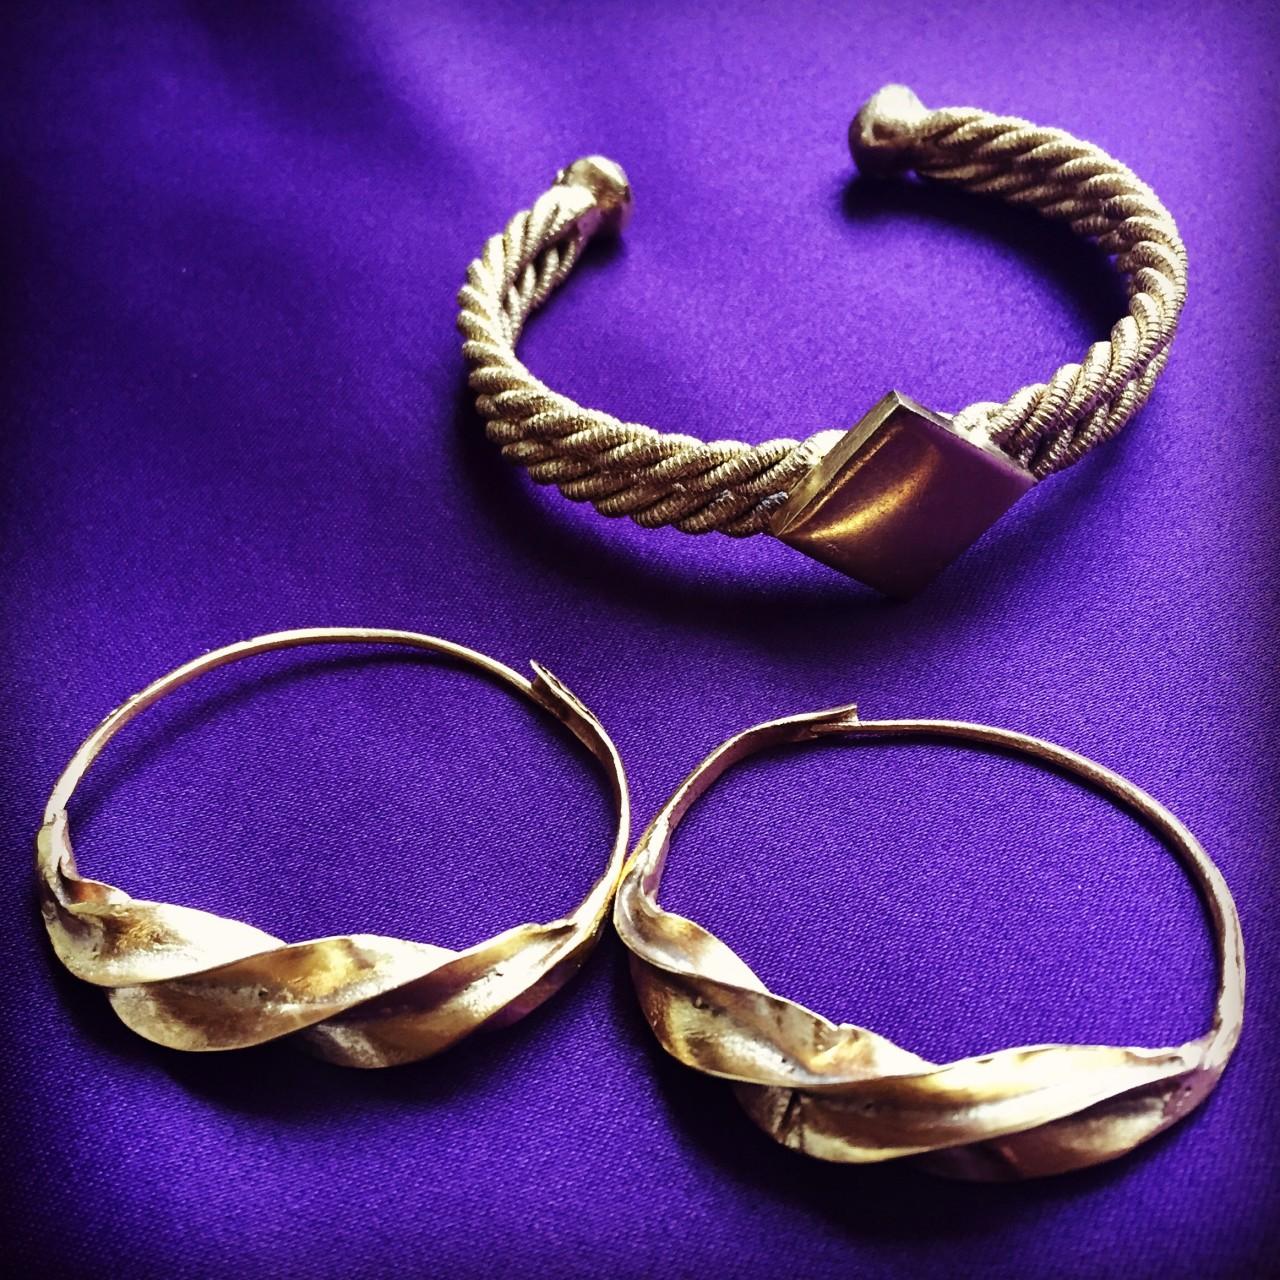 Fulaba Gold Dipped Fulani Jewelry pairing